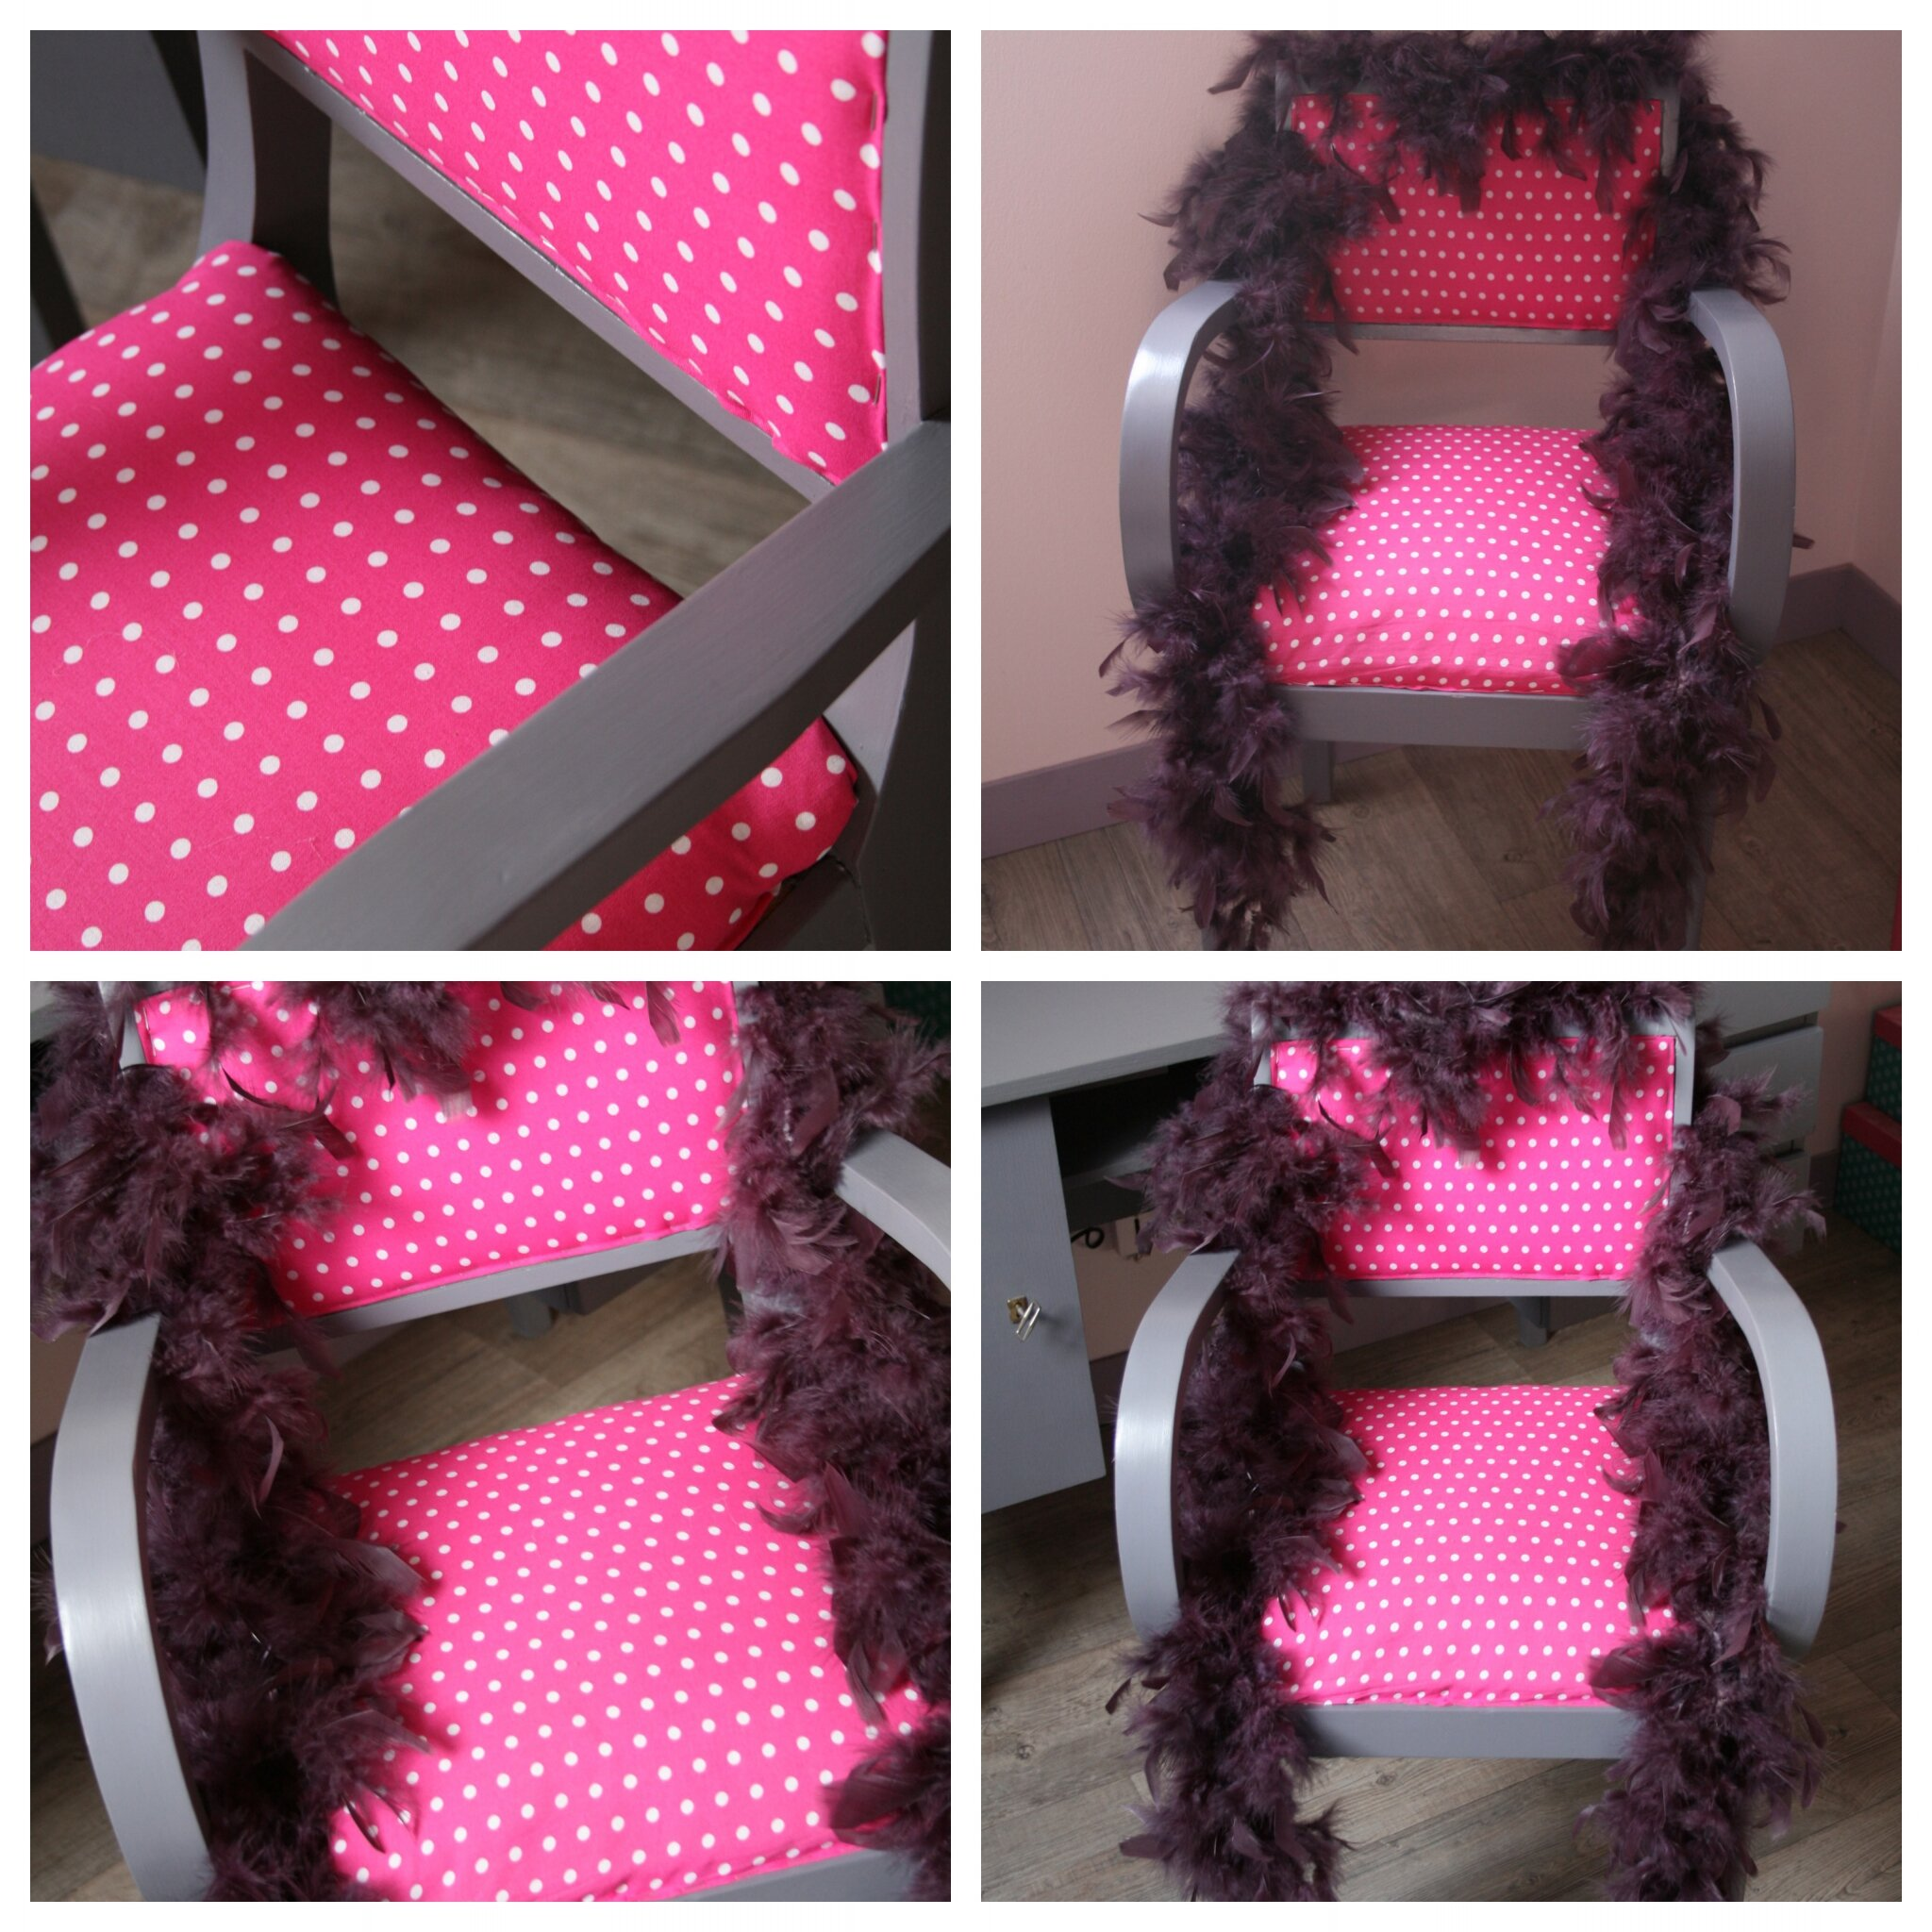 Chambre fille rose et violet vintage   n°17 l'atelier